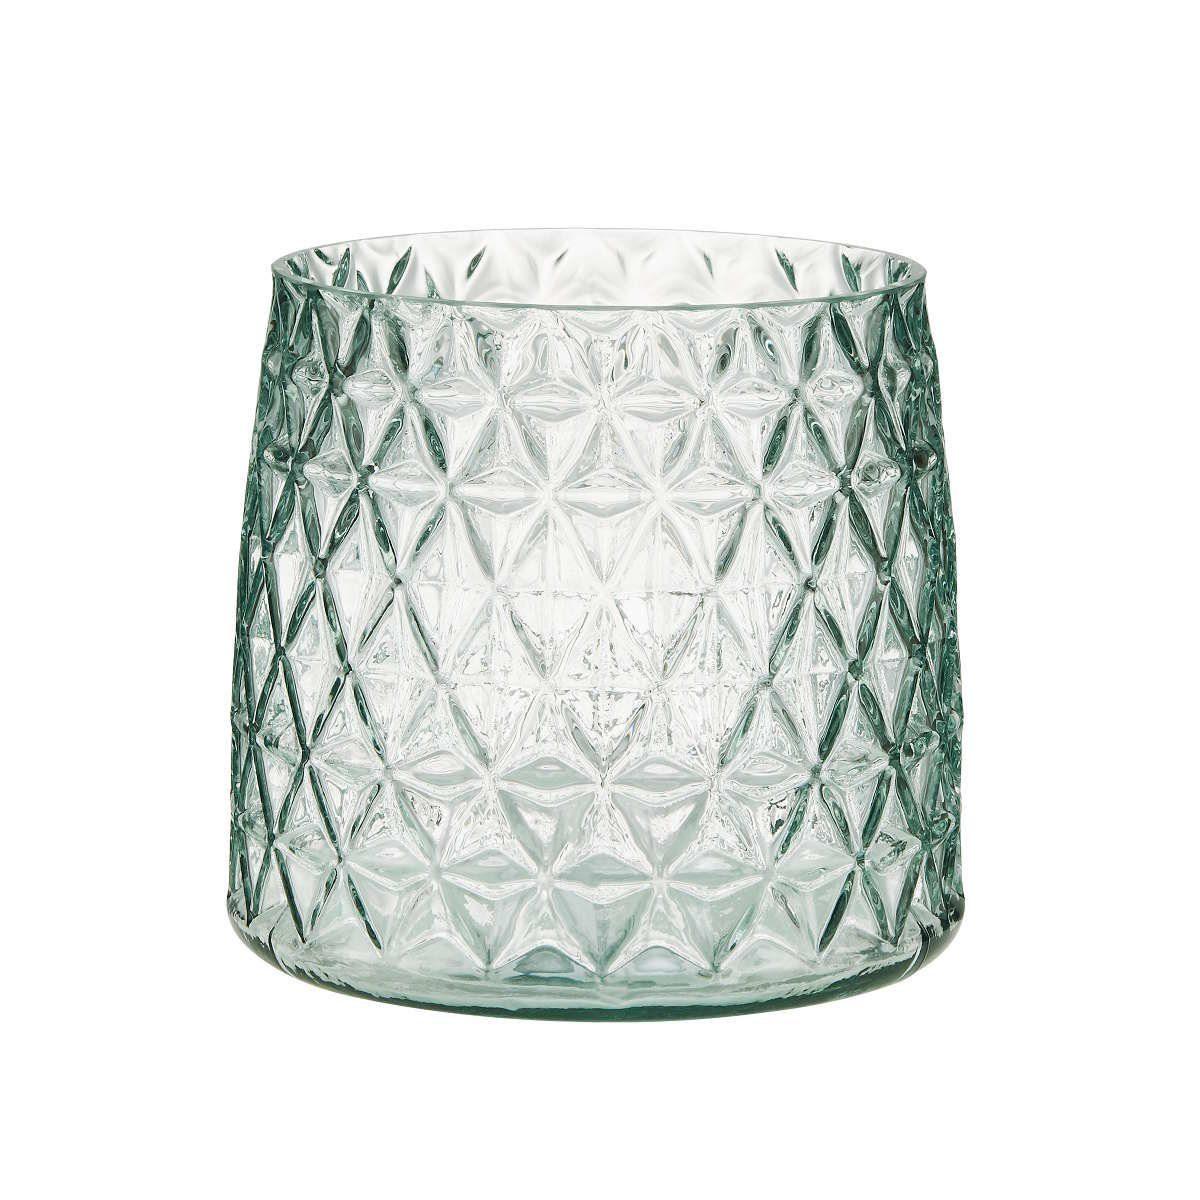 BUTLERS BEVERLY »Vase Höhe 17 cm«